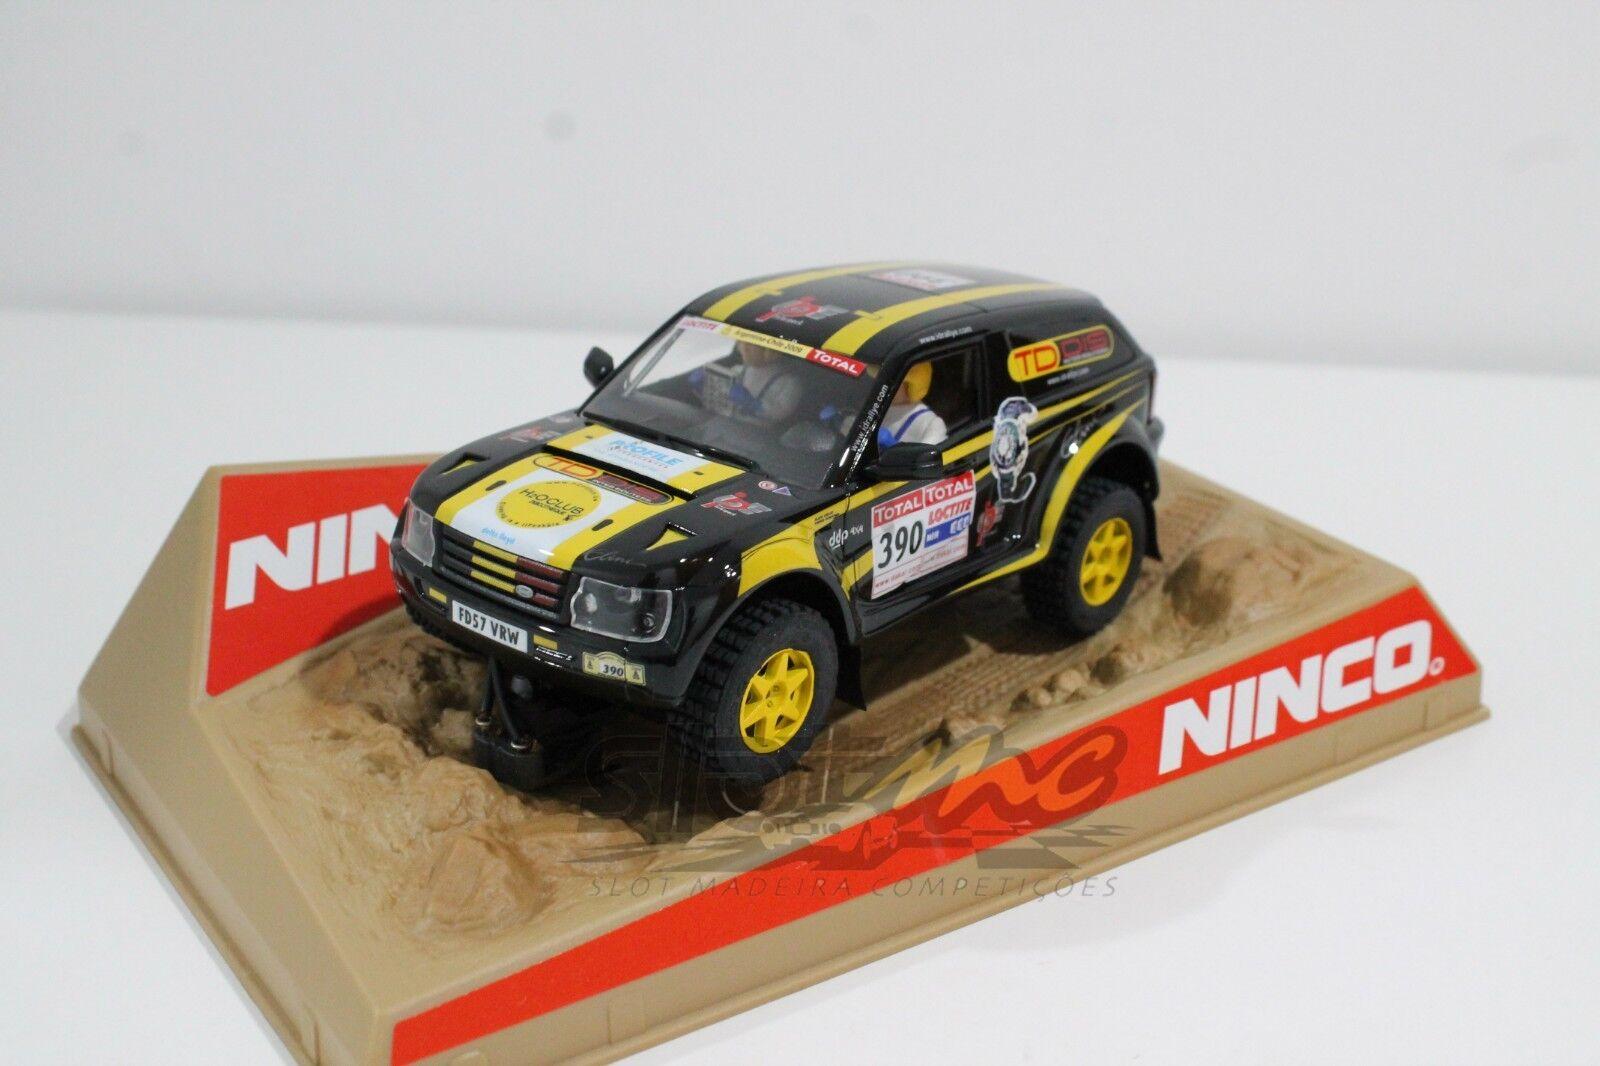 Ninco 50563 Bowler  Equipo ID Rallye  Dakar 2009 1 32  NEW